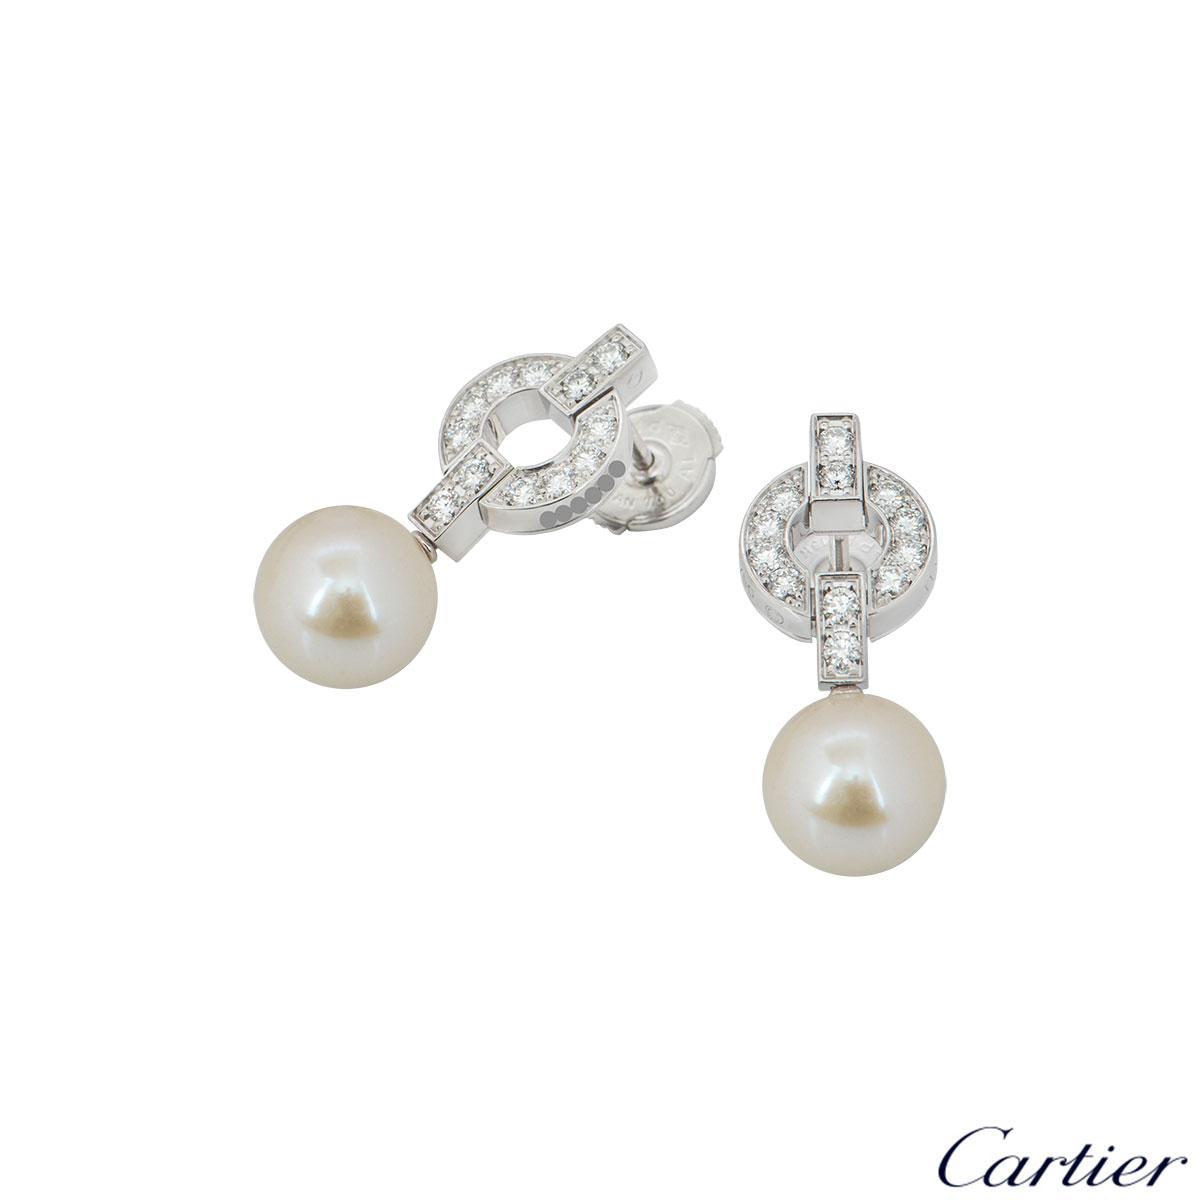 Cartier Himalia Diamond & Pearl Earrings B8039600